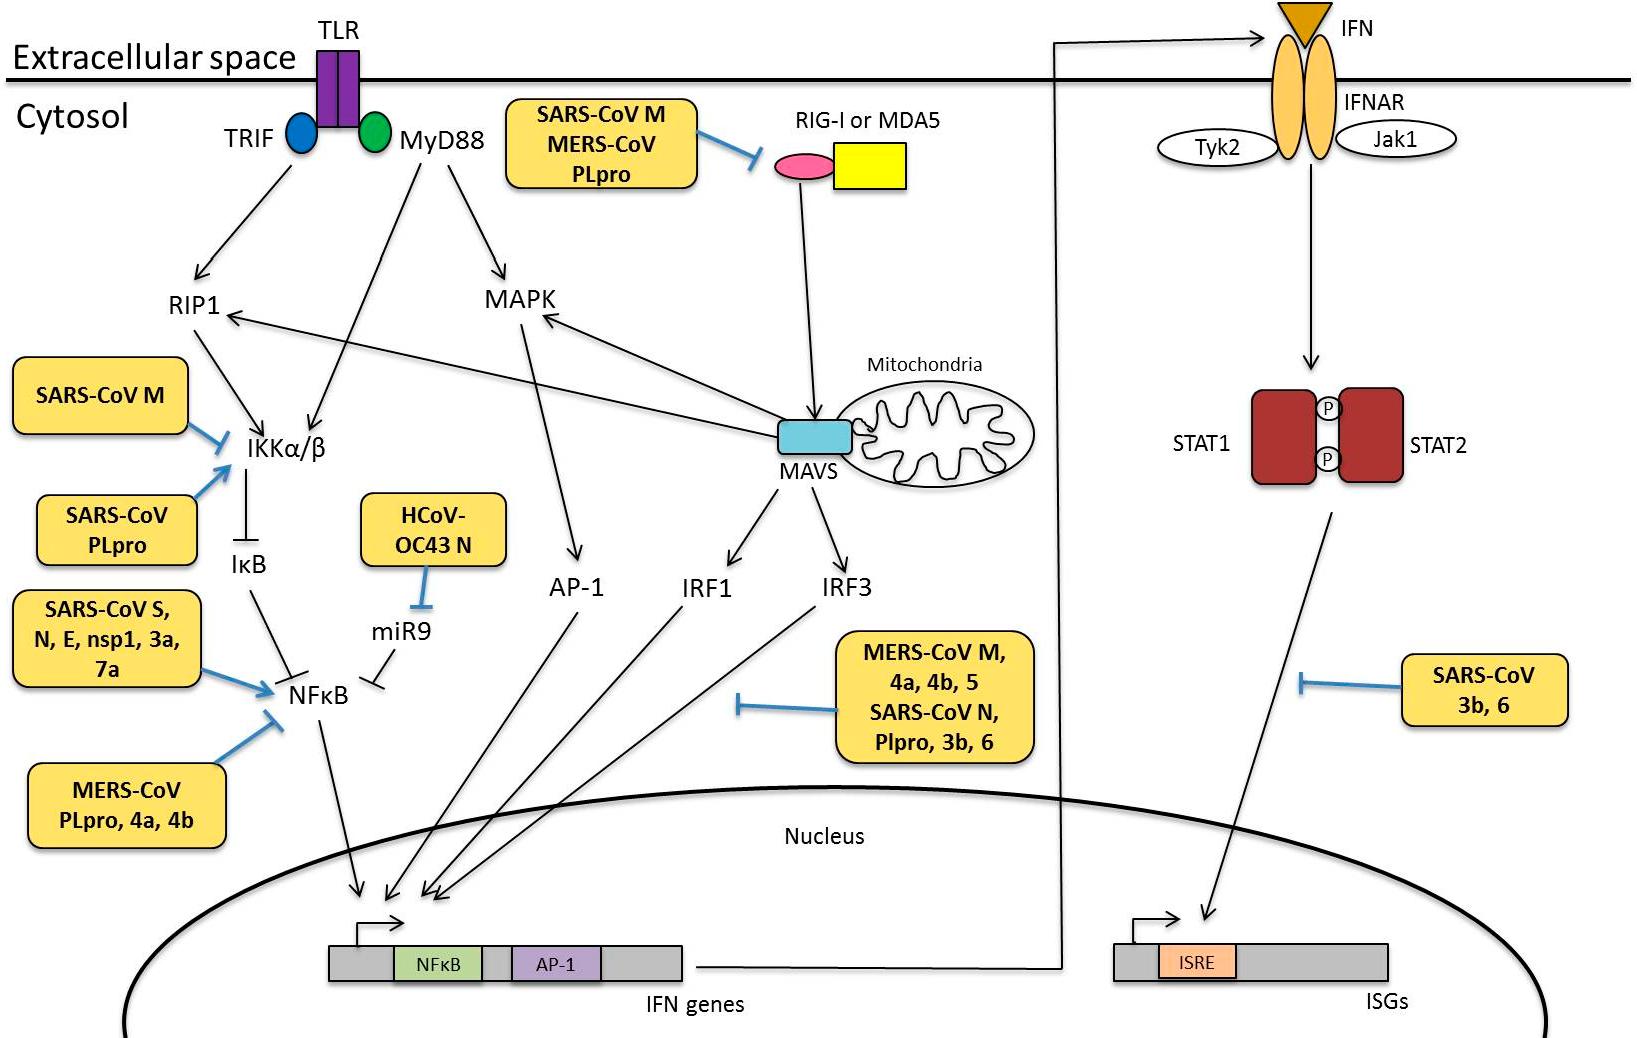 HCoV病毒蛋白对先天免疫的影响.png